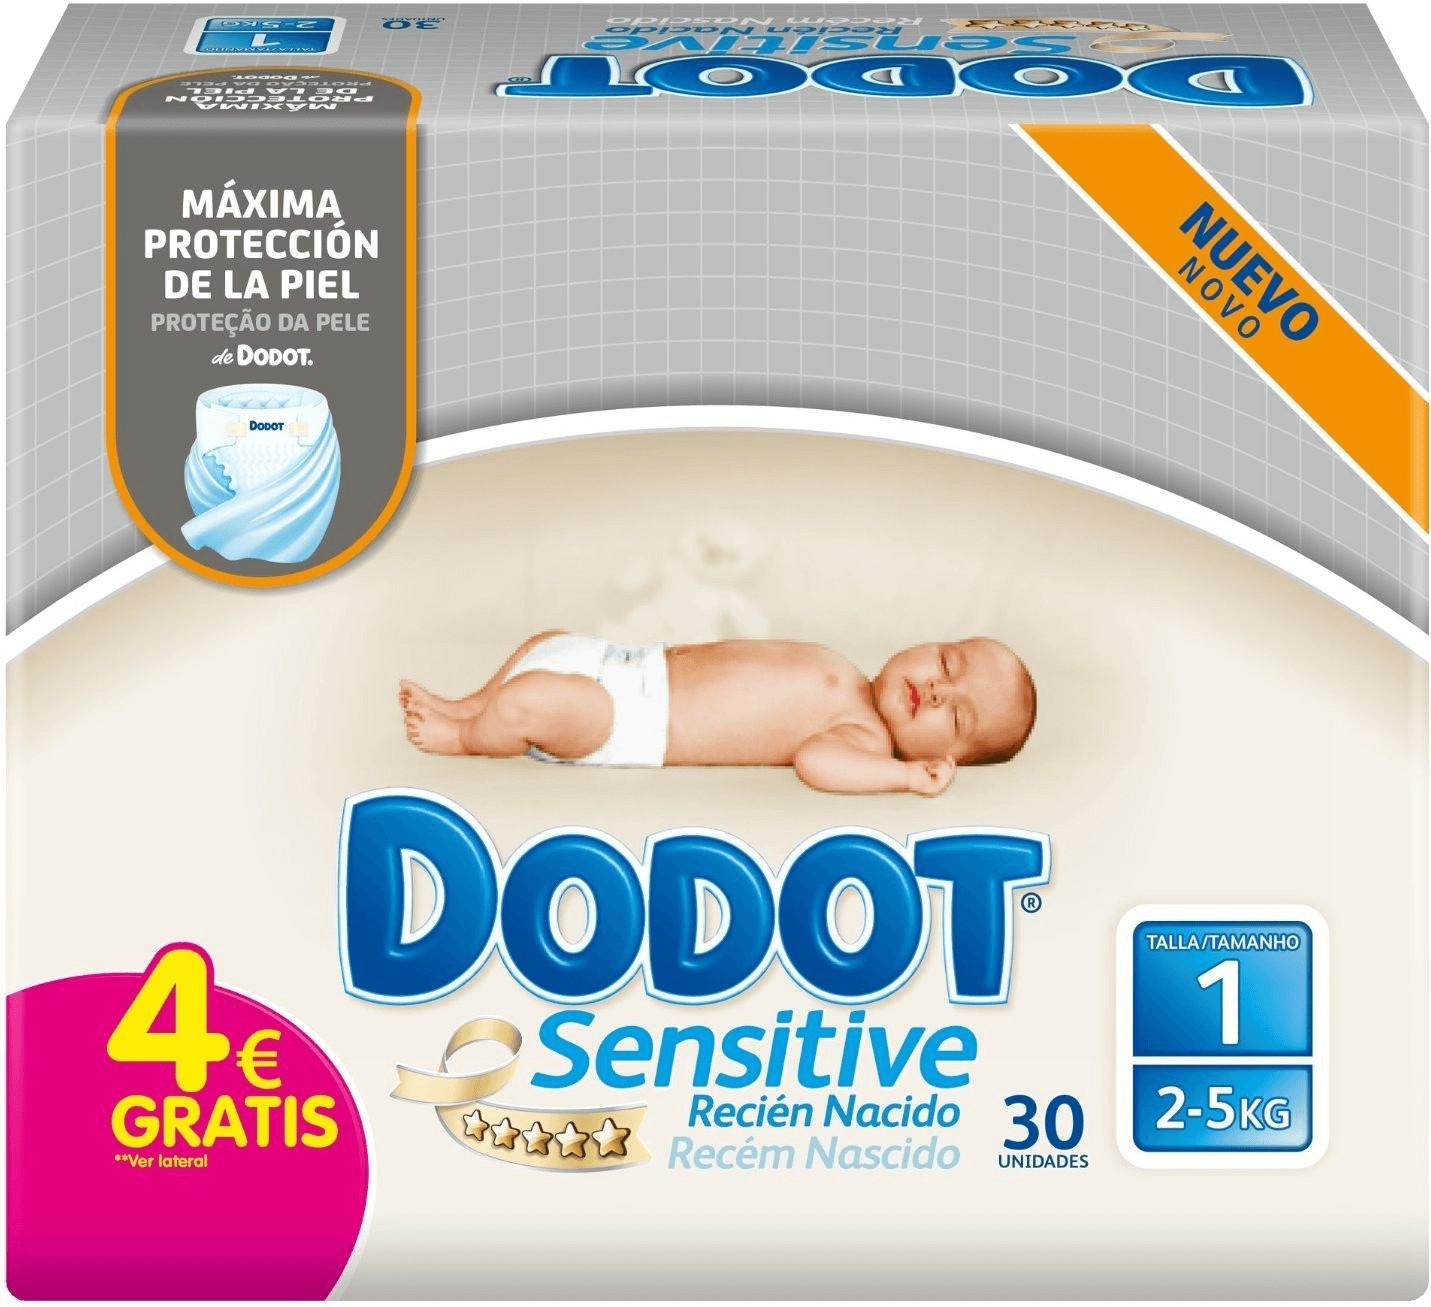 DODOT® protection plus sensitive pañales